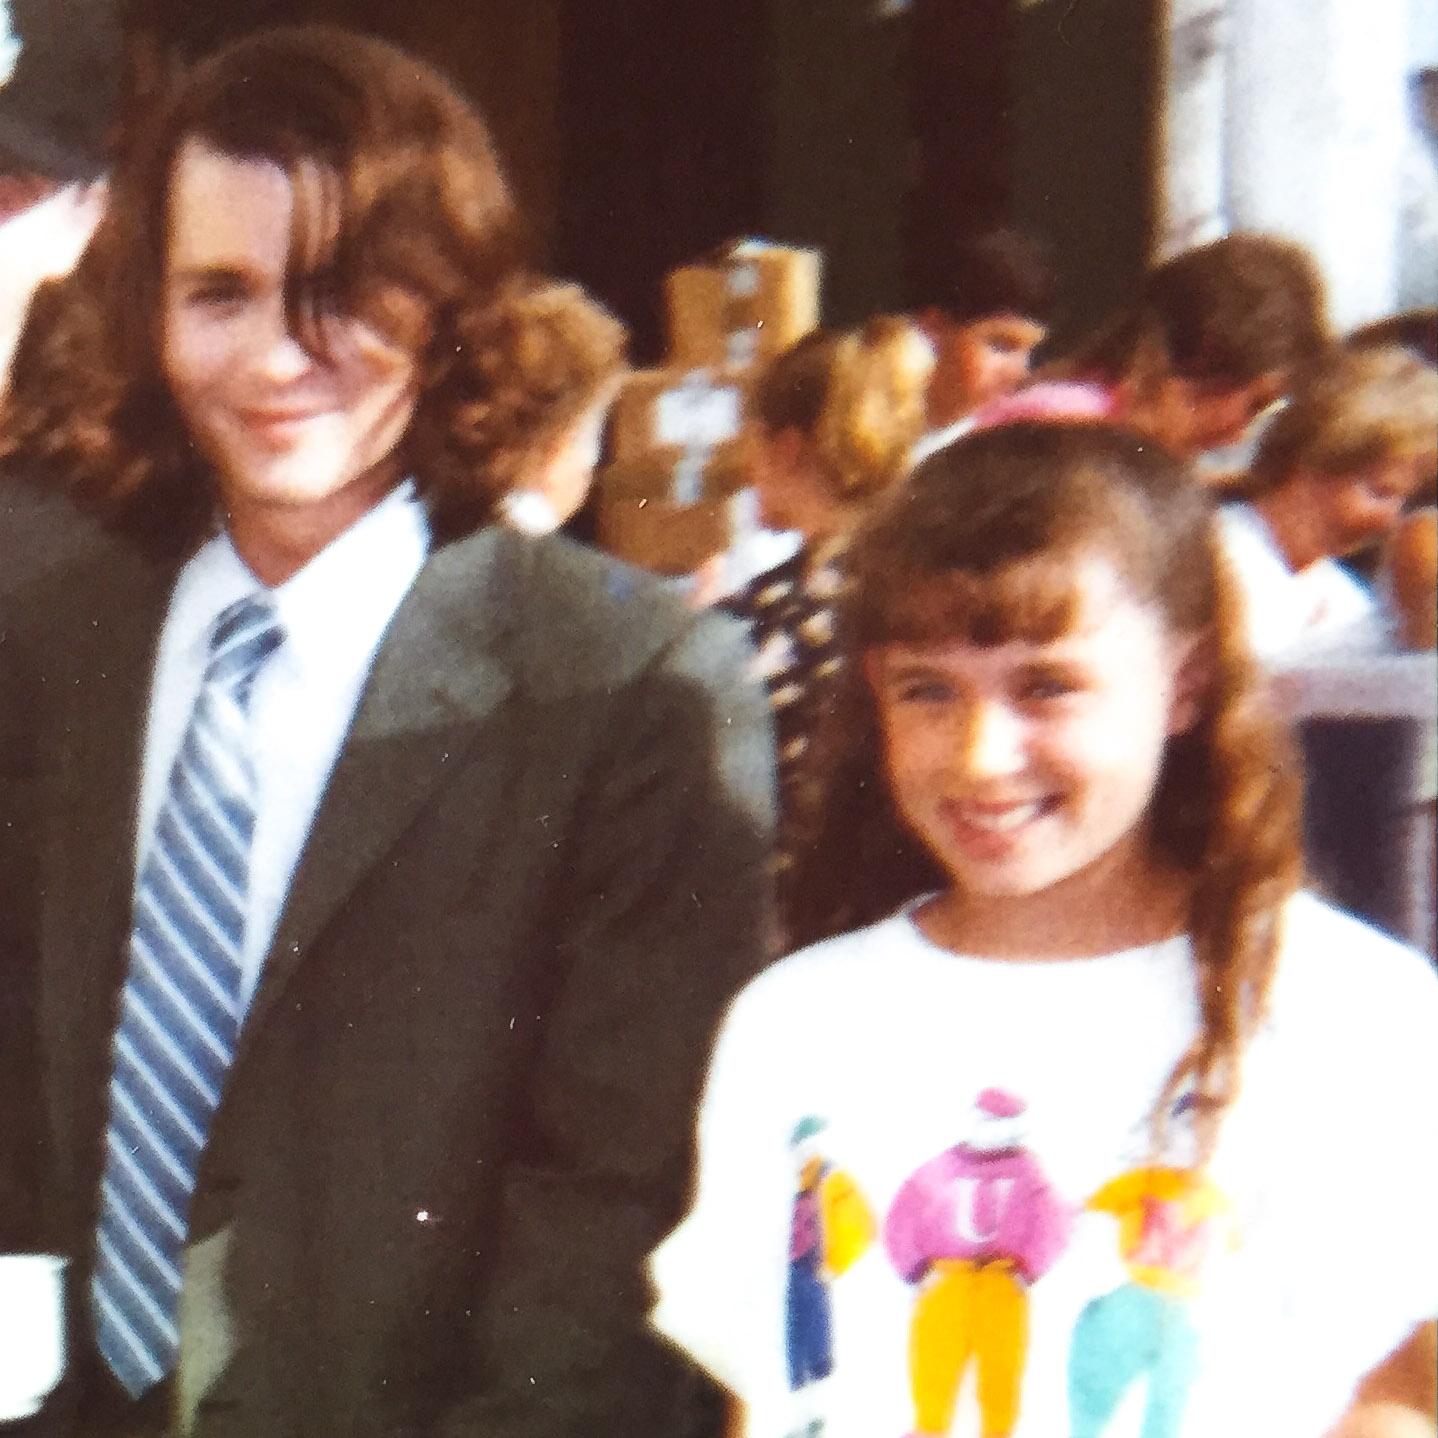 Me + Johnny Depp = <3